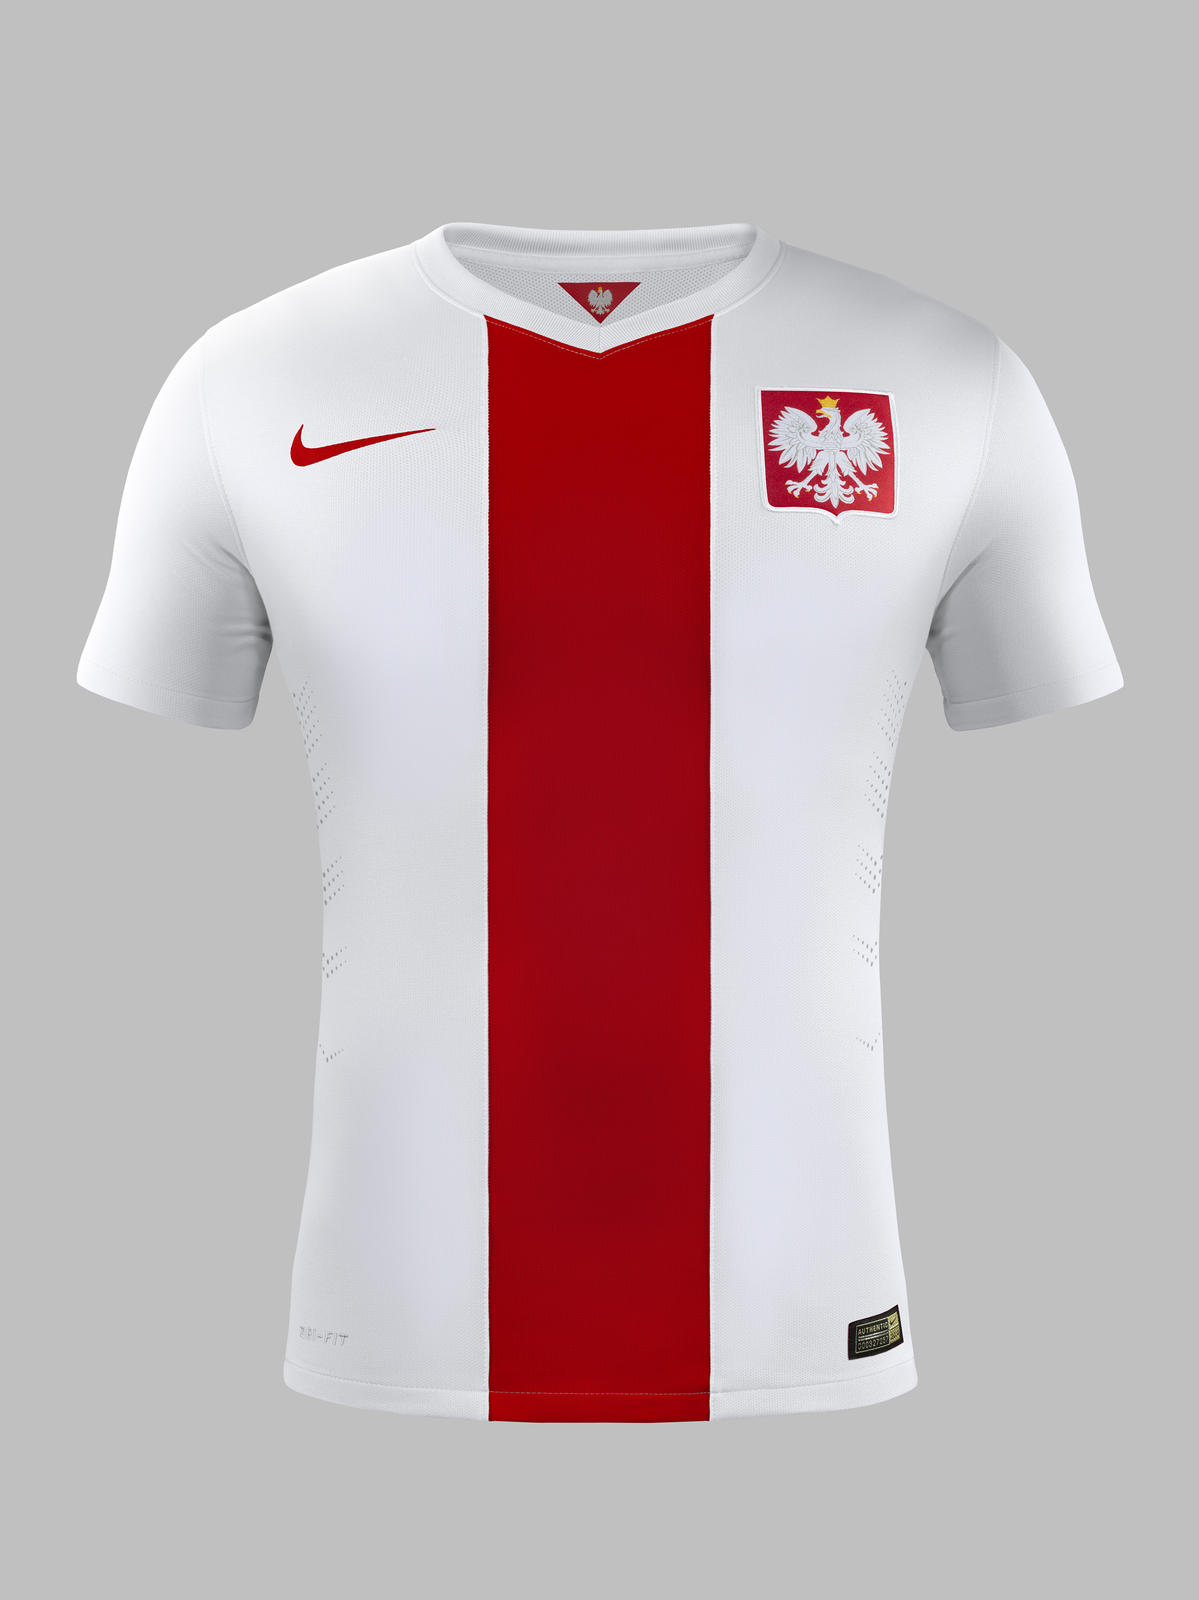 Poland Unveils New National Team Kit With Nike Nike News